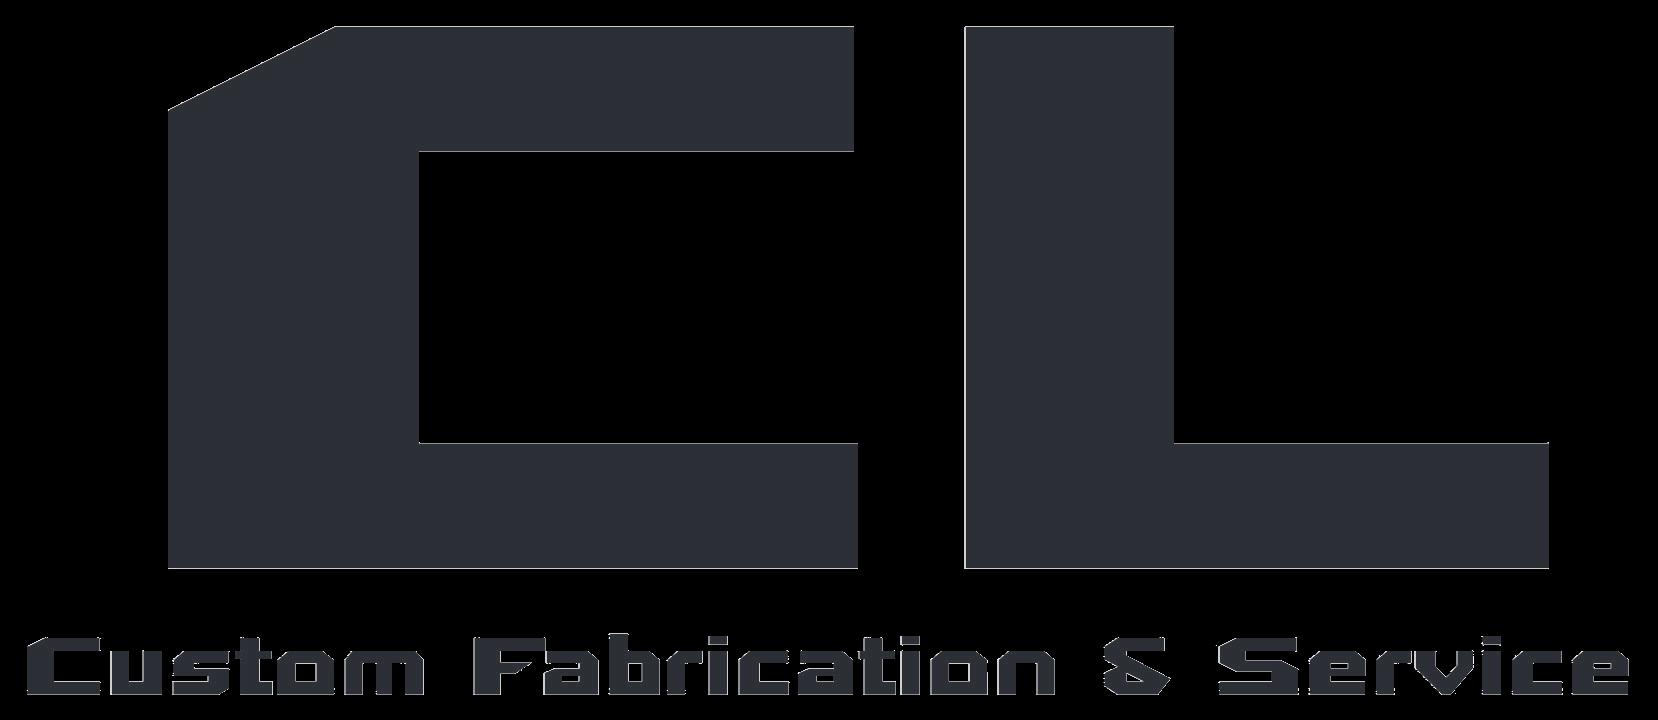 CL Custom Fabrication & Service